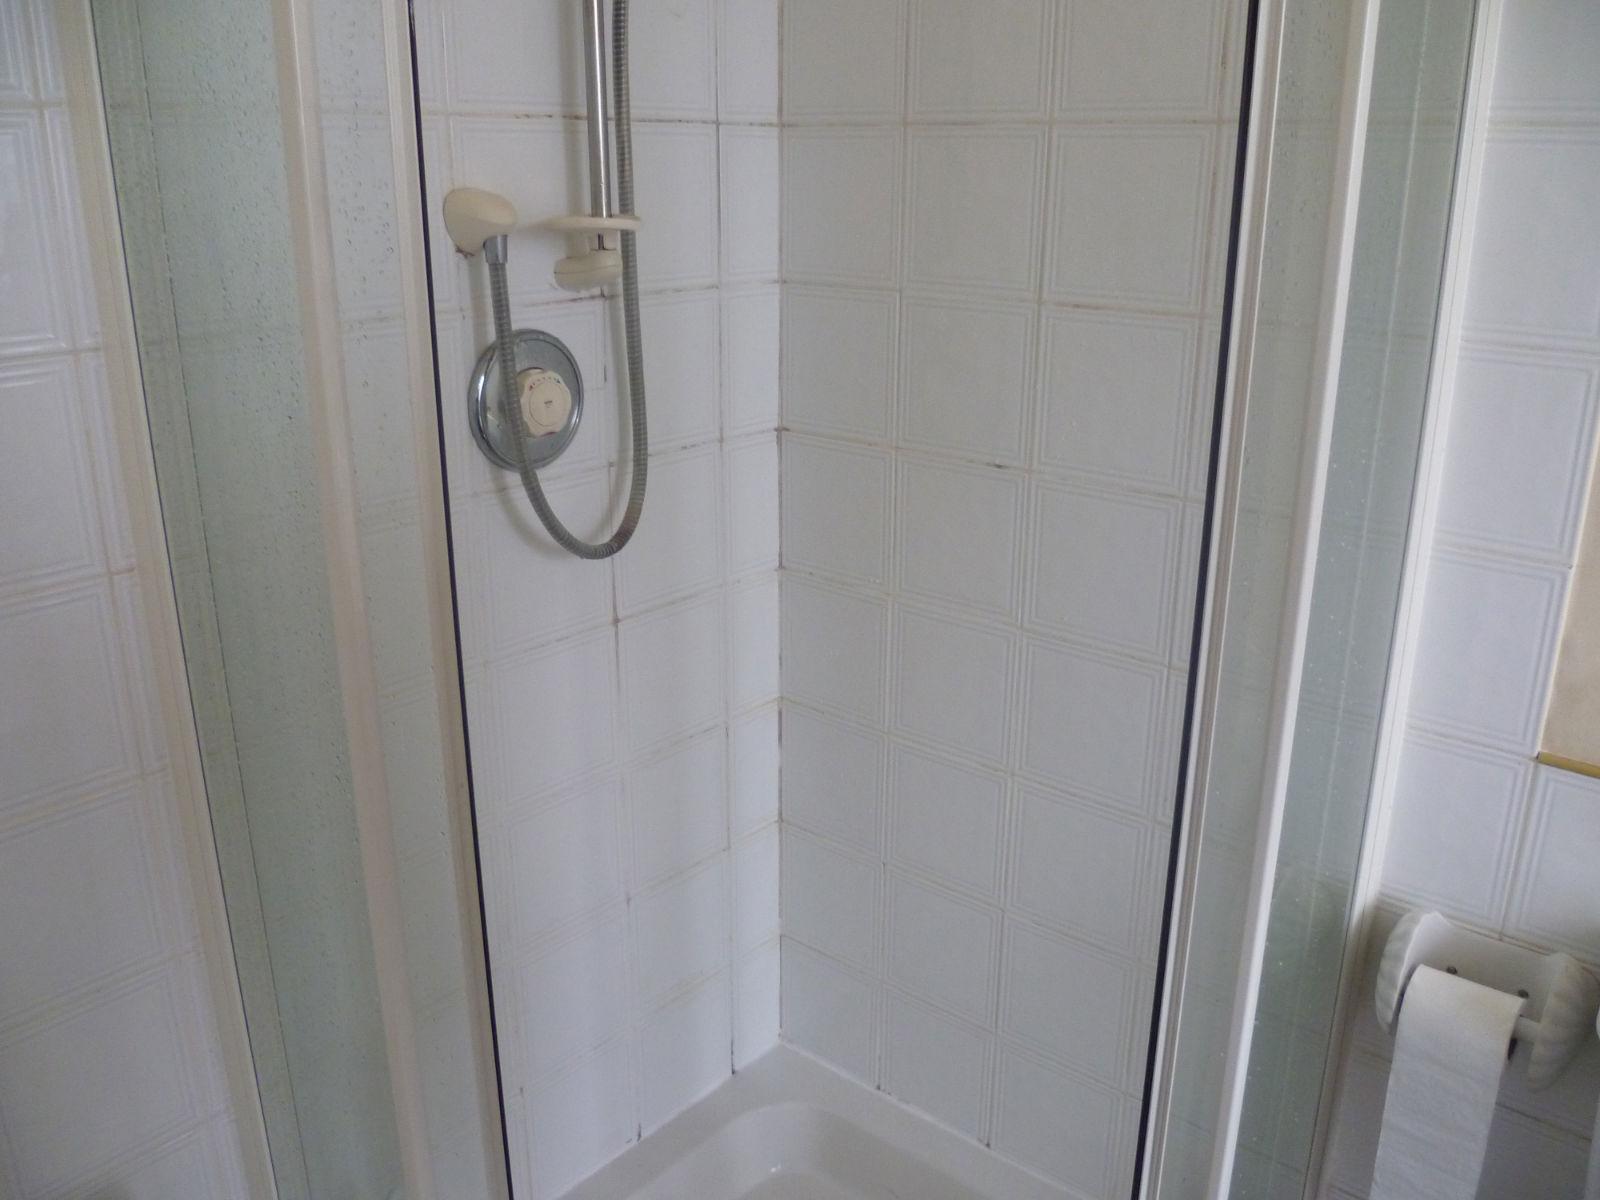 Gruby Ceramic Tiled Shower in Bishopton Before